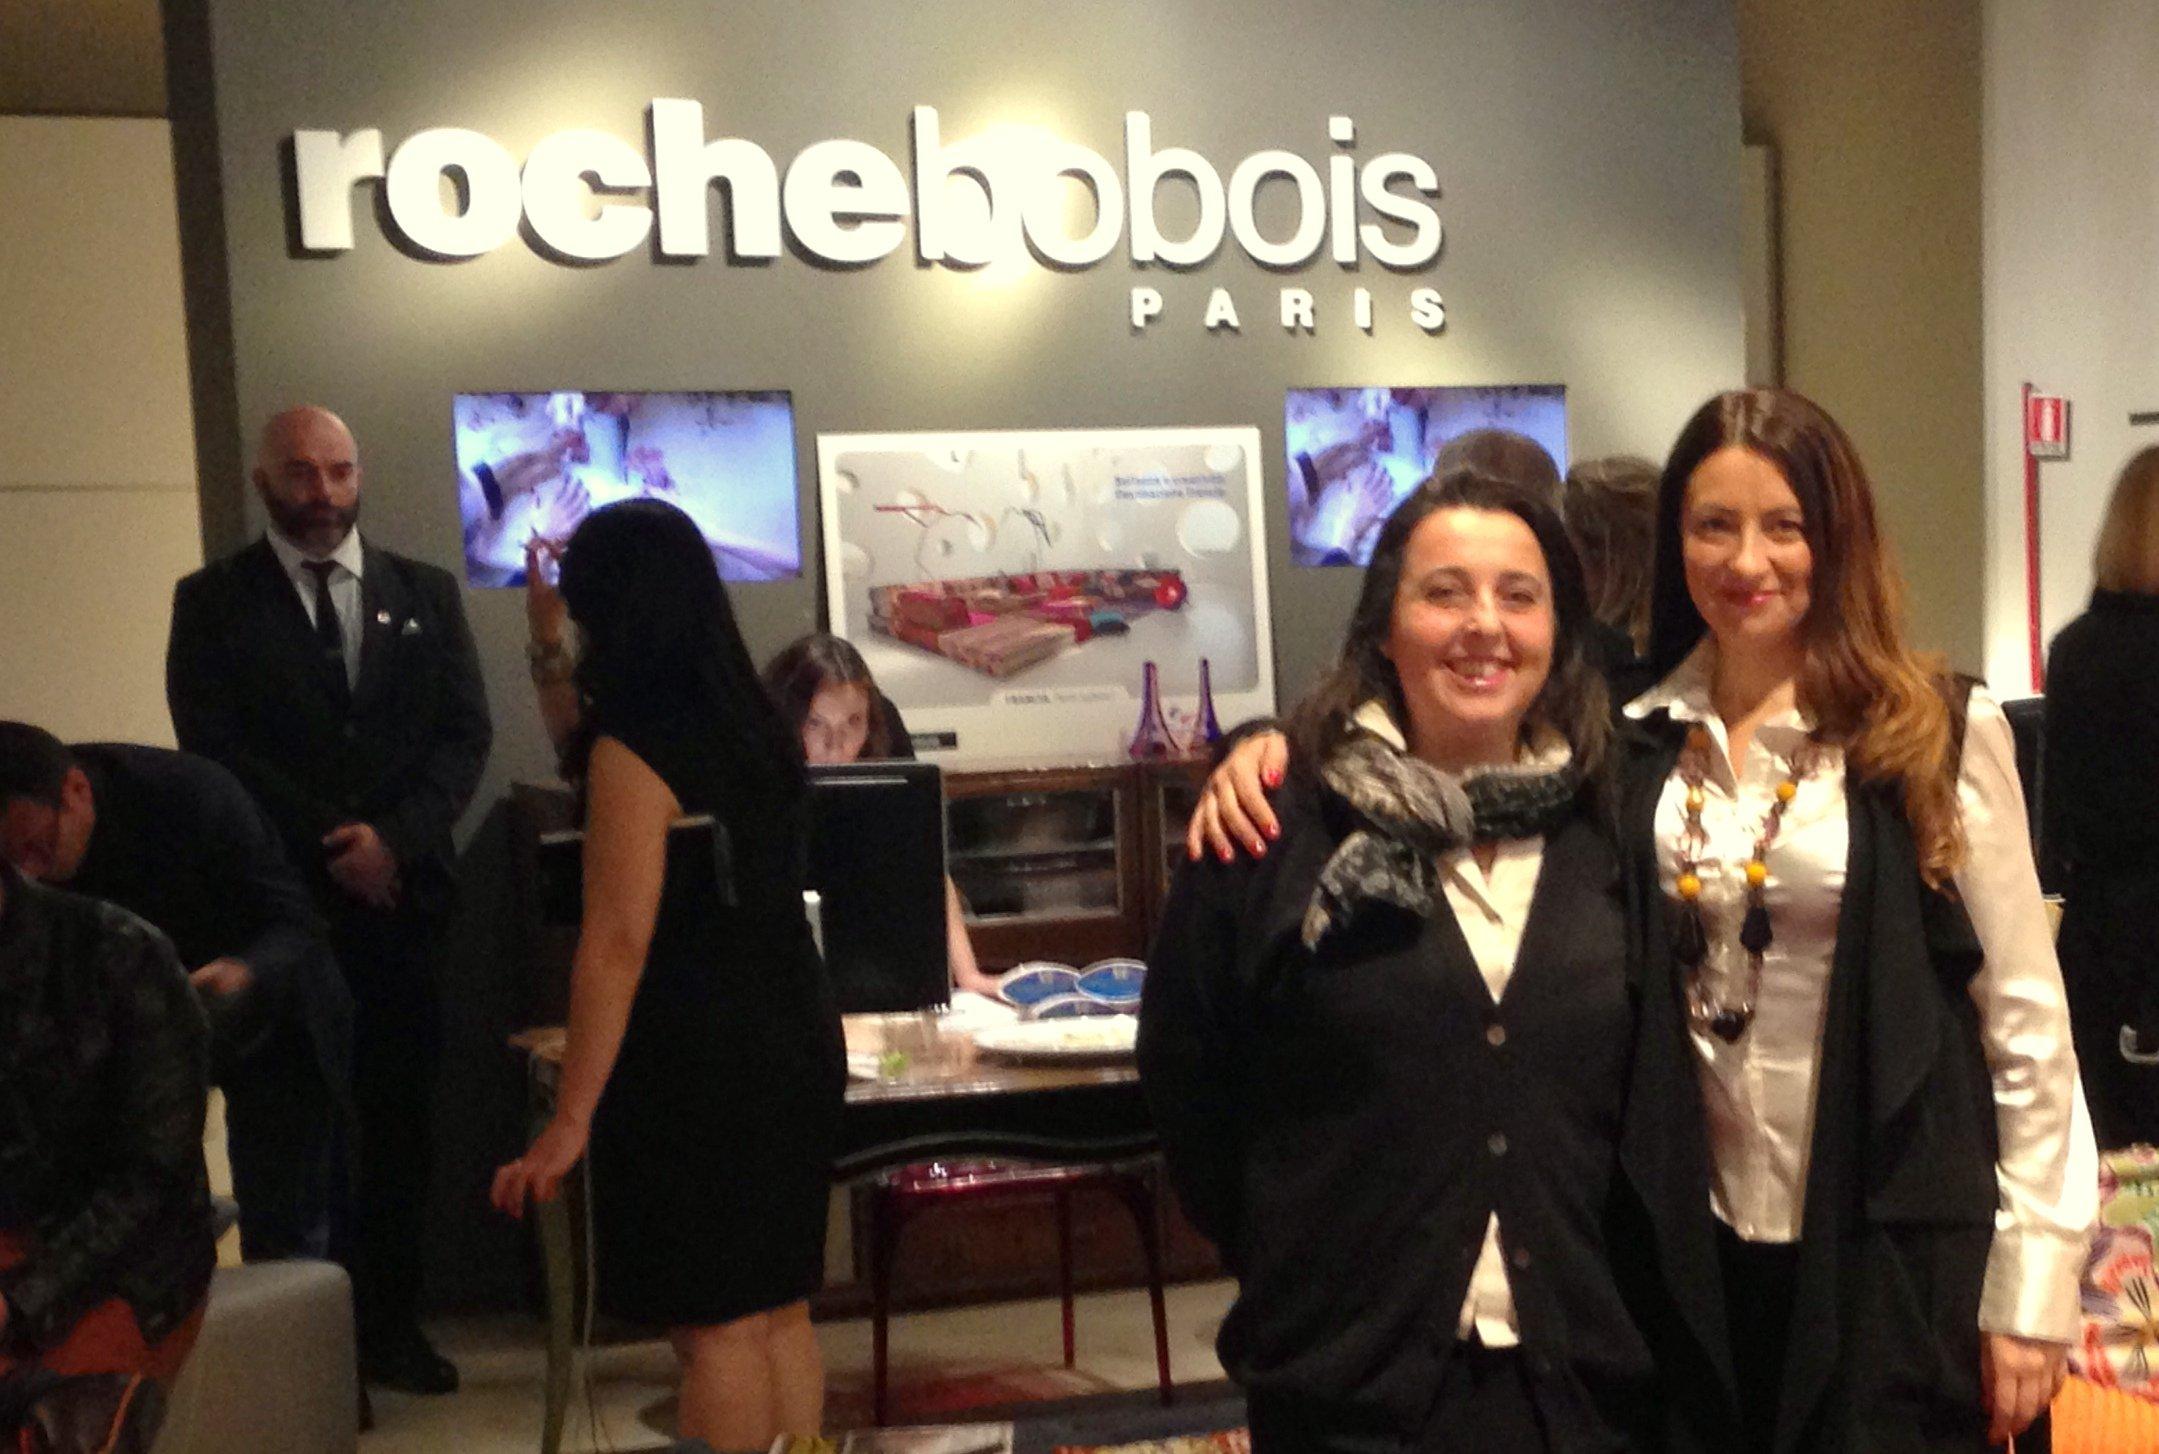 Beautiful Roche Bobois Roma Images - bakeroffroad.us - bakeroffroad.us